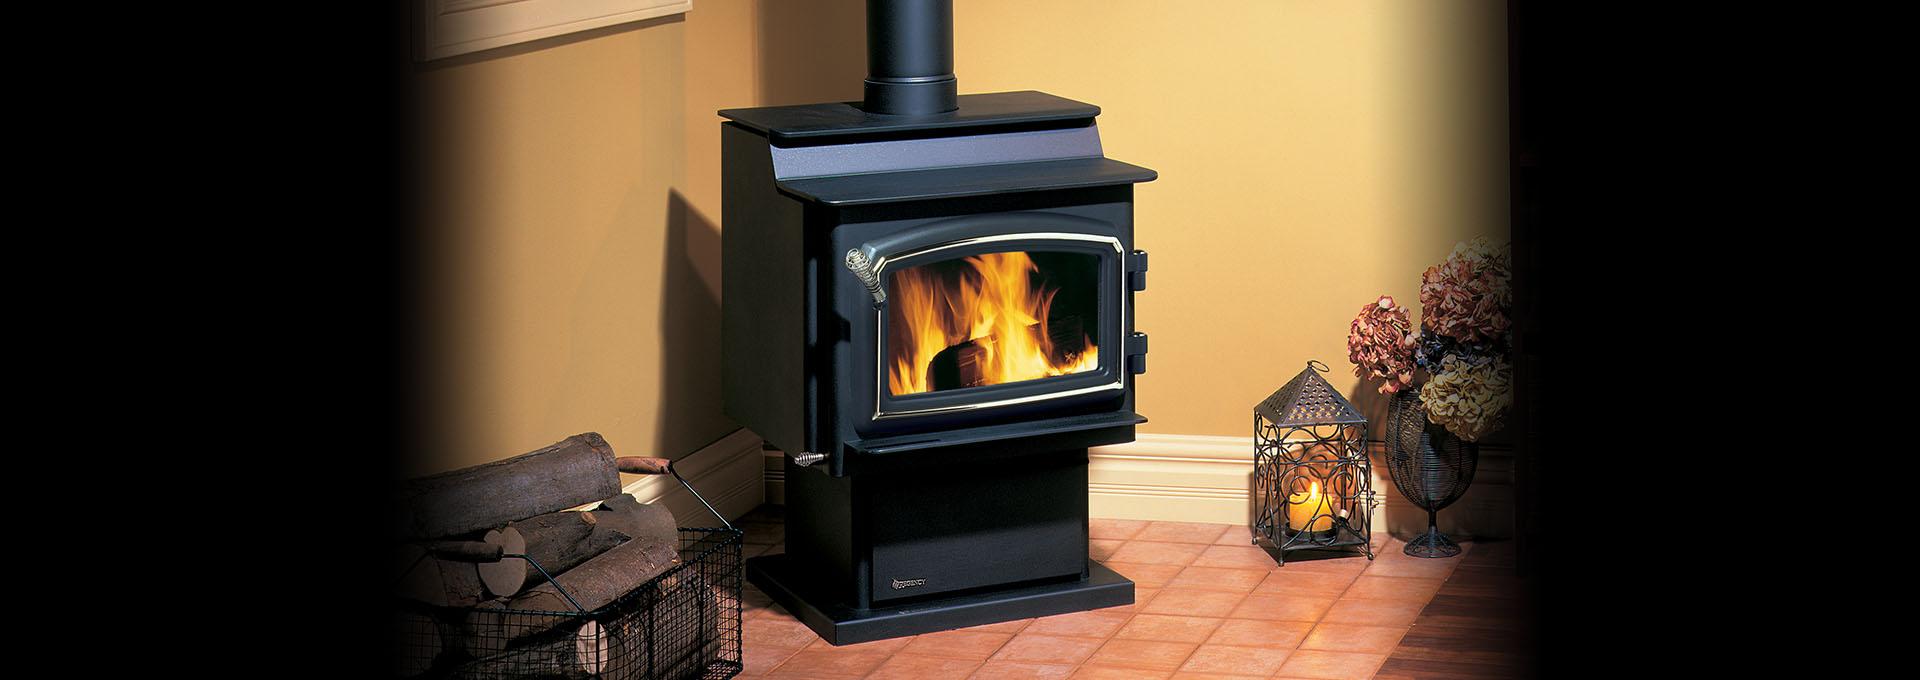 Fireplaces Wood Burning Stoves Wood Fireplaces Classic